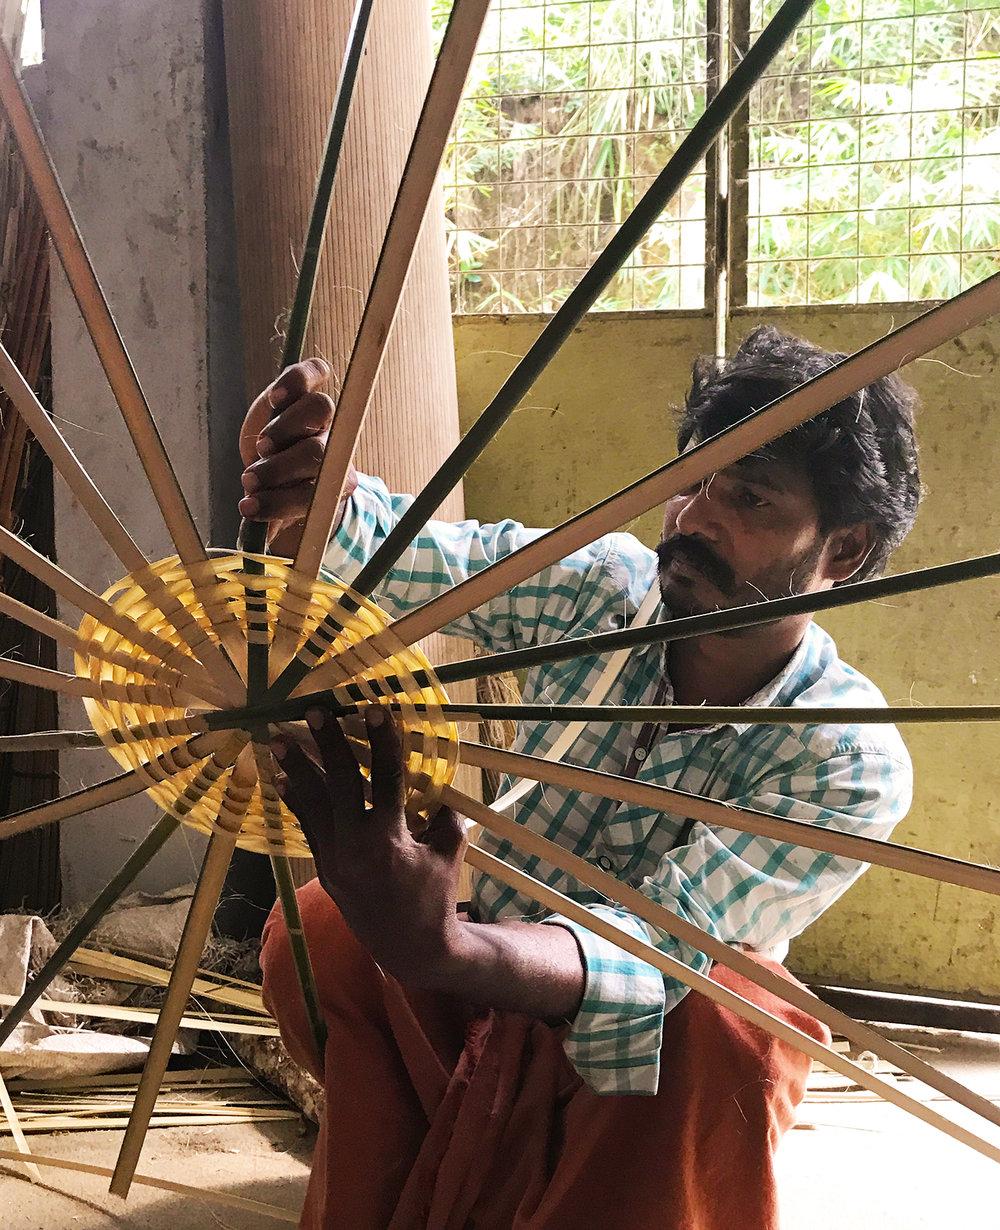 Raju the man for bamboo baskets.